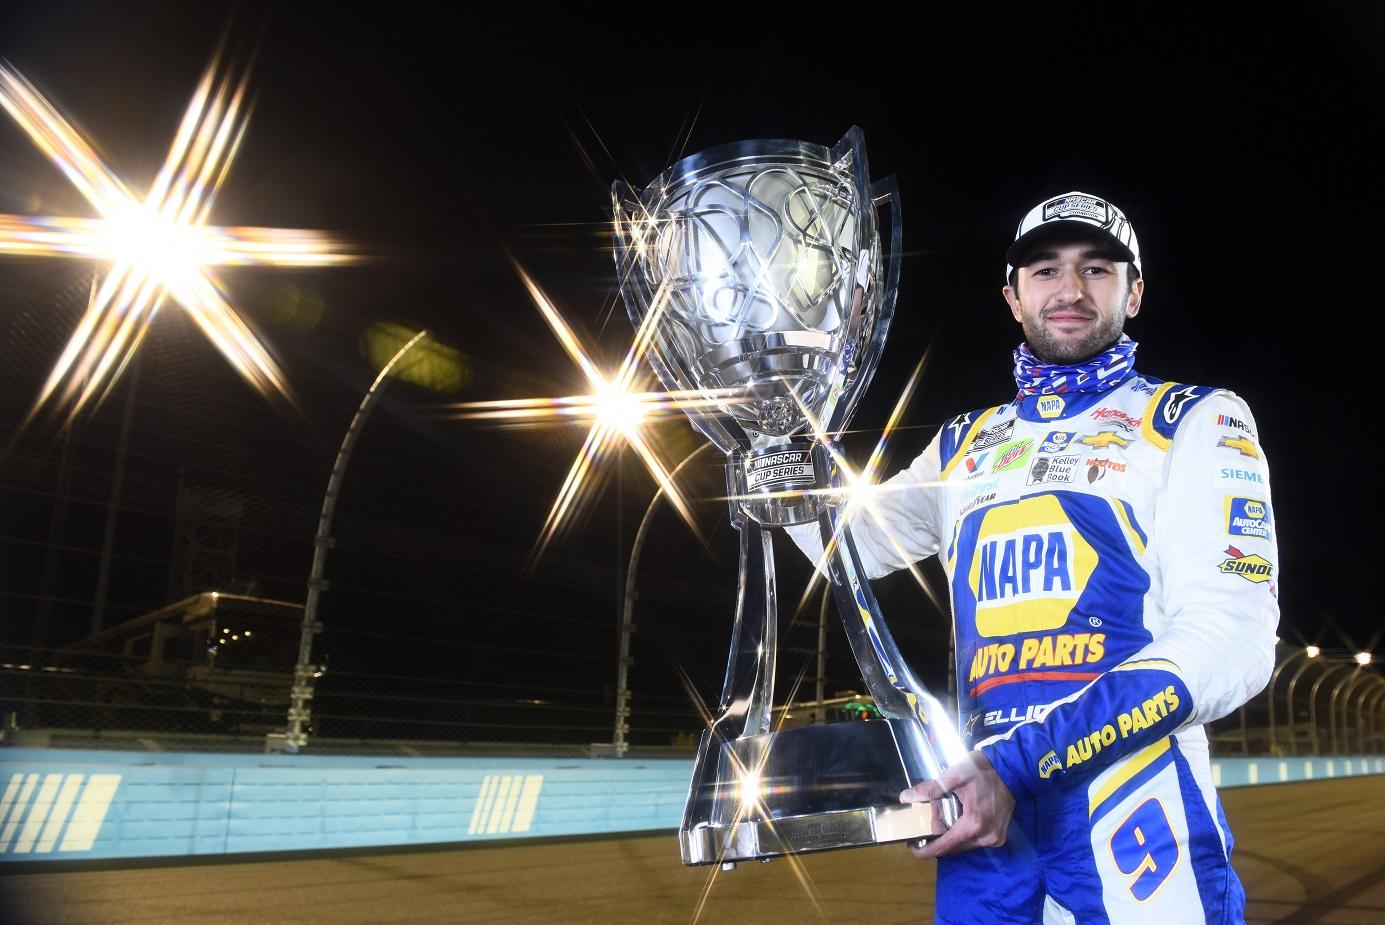 Chase Elliott holding NASCAR Cup trophy